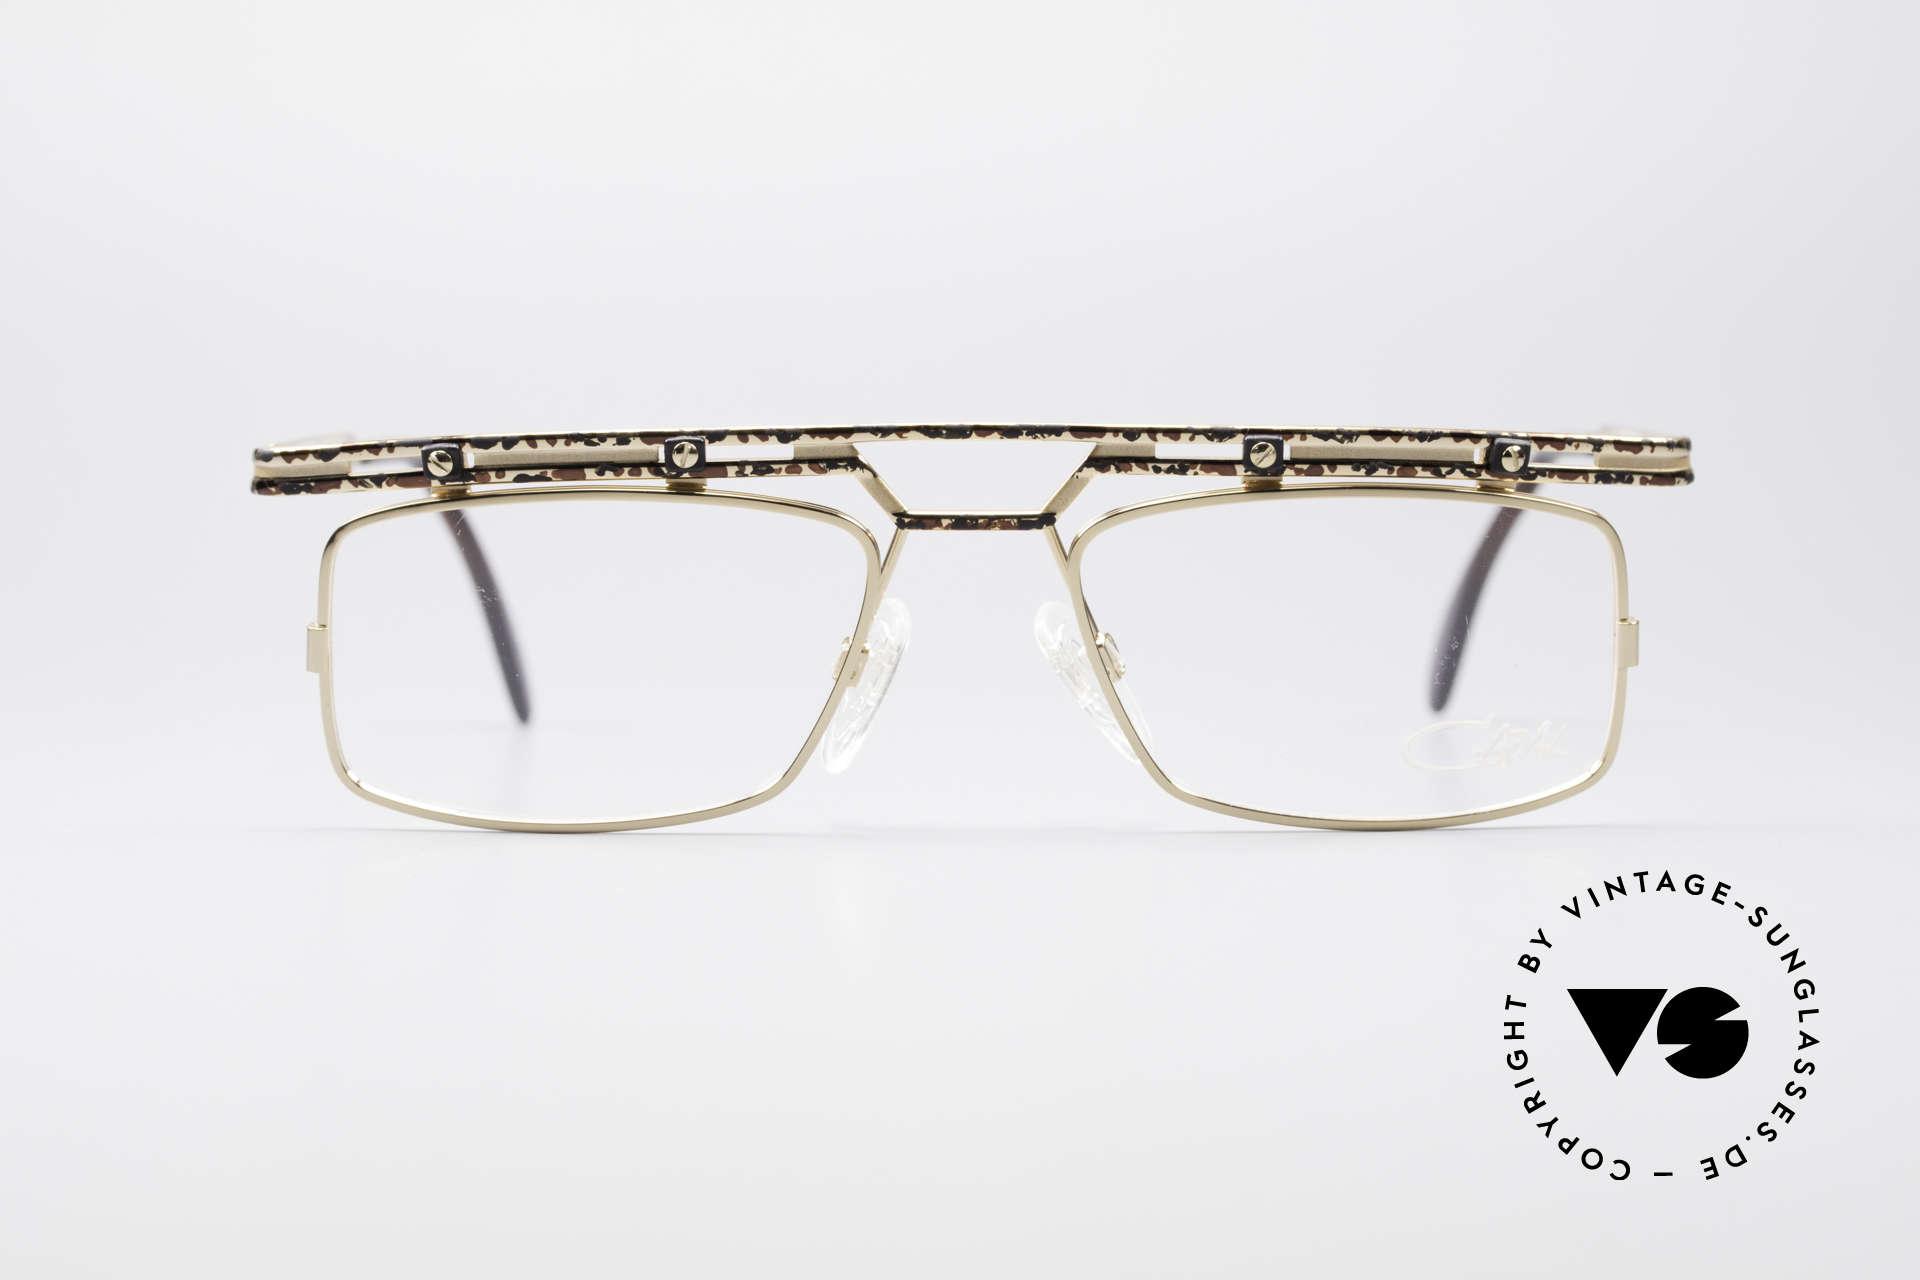 Cazal 975 True Vintage No Retro Glasses, designer eyeglass-frame by Cari Zalloni (Mr. CAZAL), Made for Men